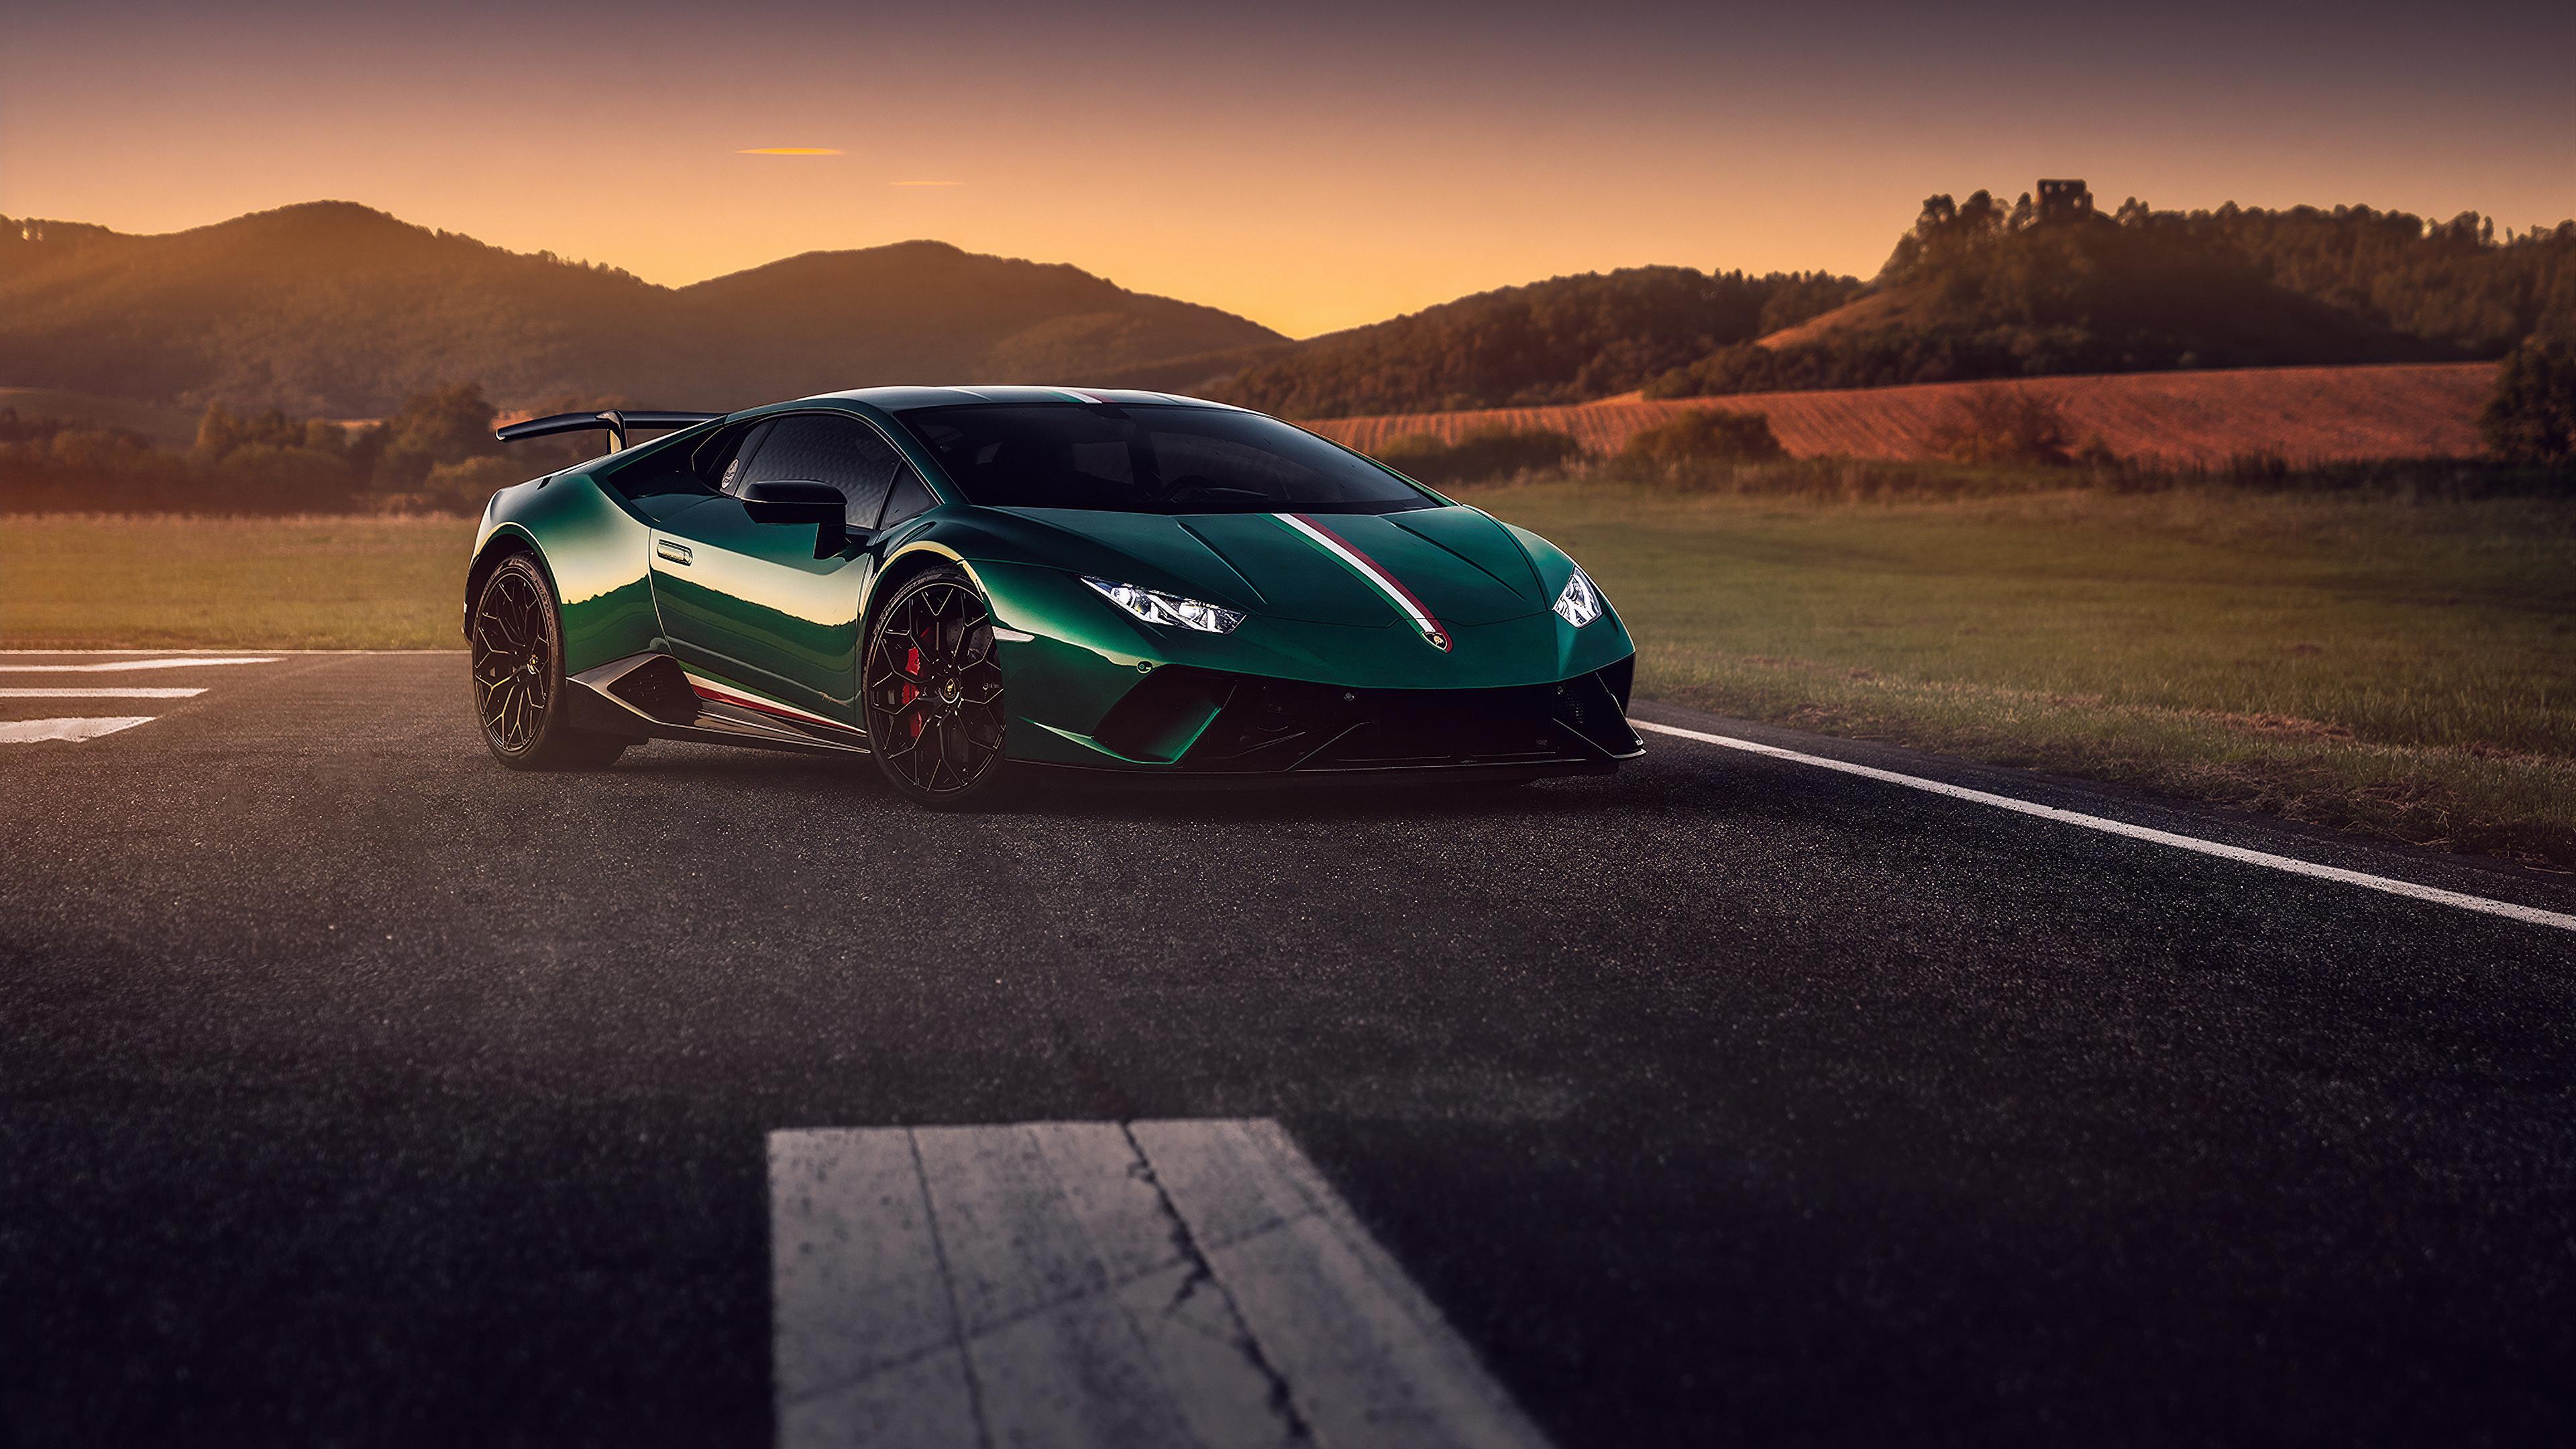 green lamborghini huracan 2019 1572661095 - Green Lamborghini Huracan 2019 - lamborghini huracan wallpapers, hd-wallpapers, cars wallpapers, behance wallpapers, 4k-wallpapers